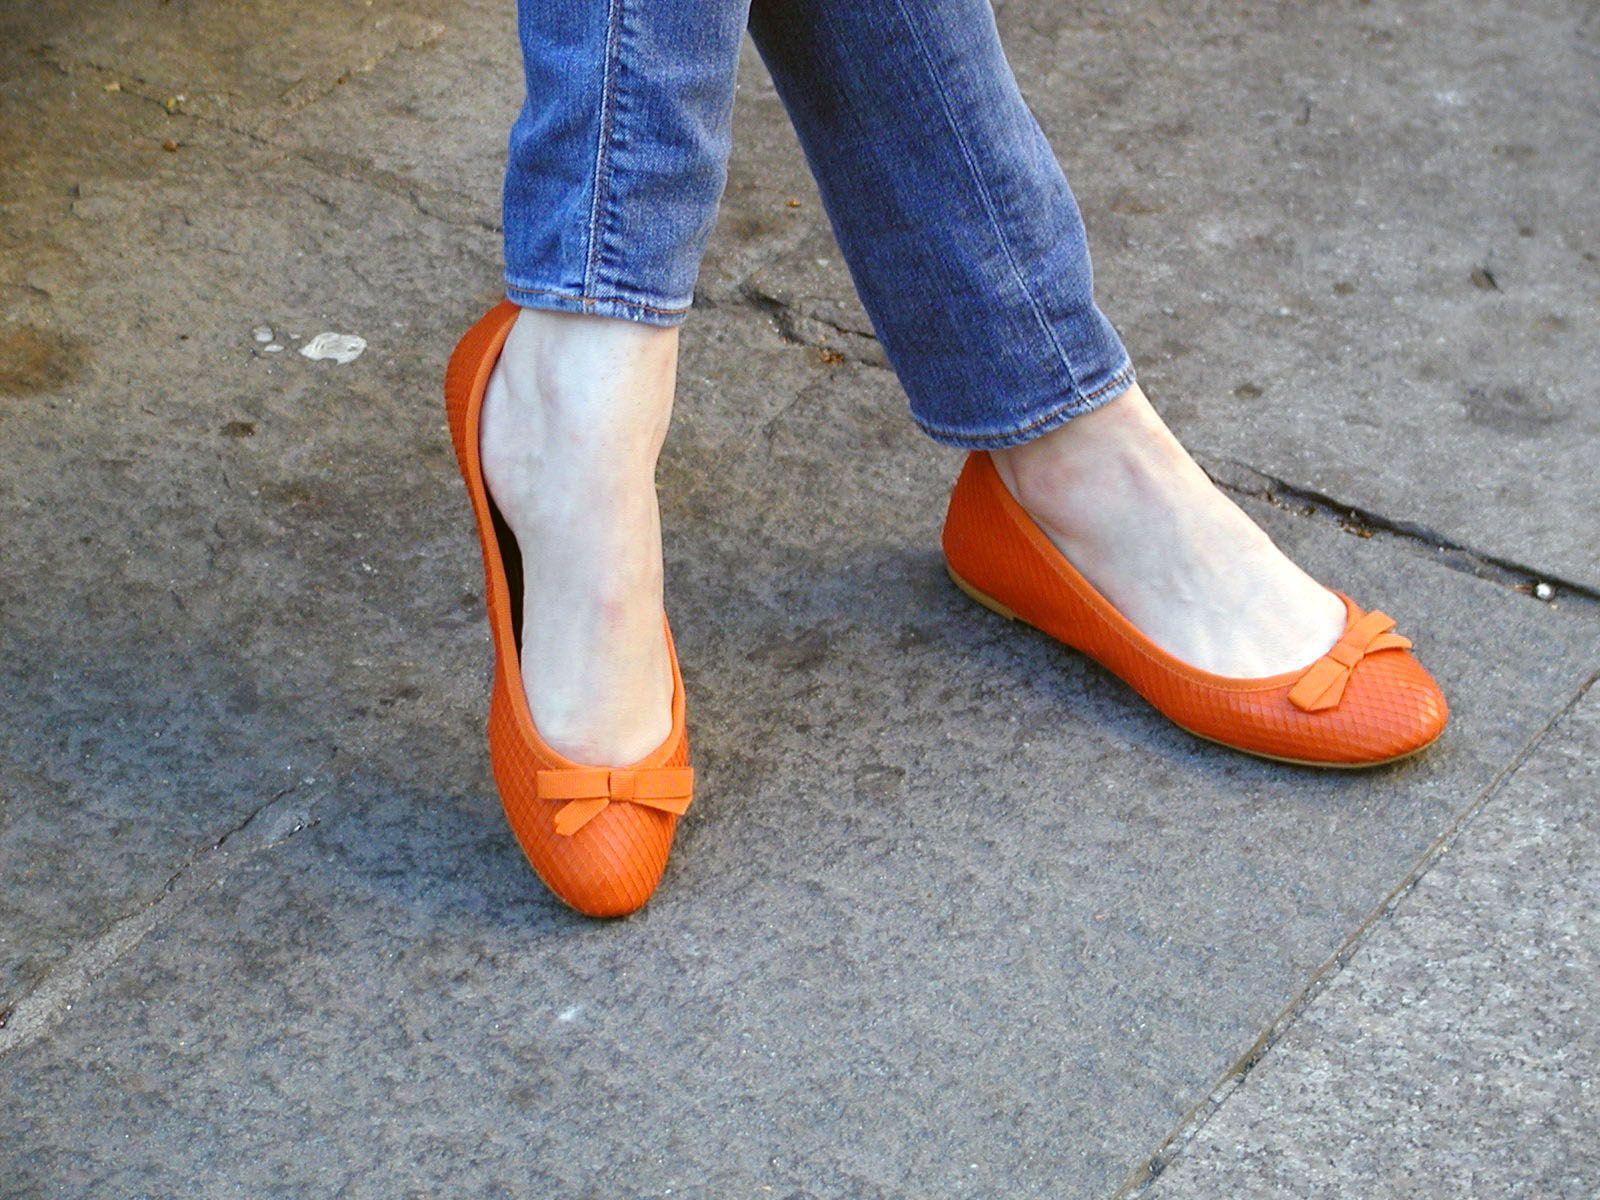 chic orange shoes